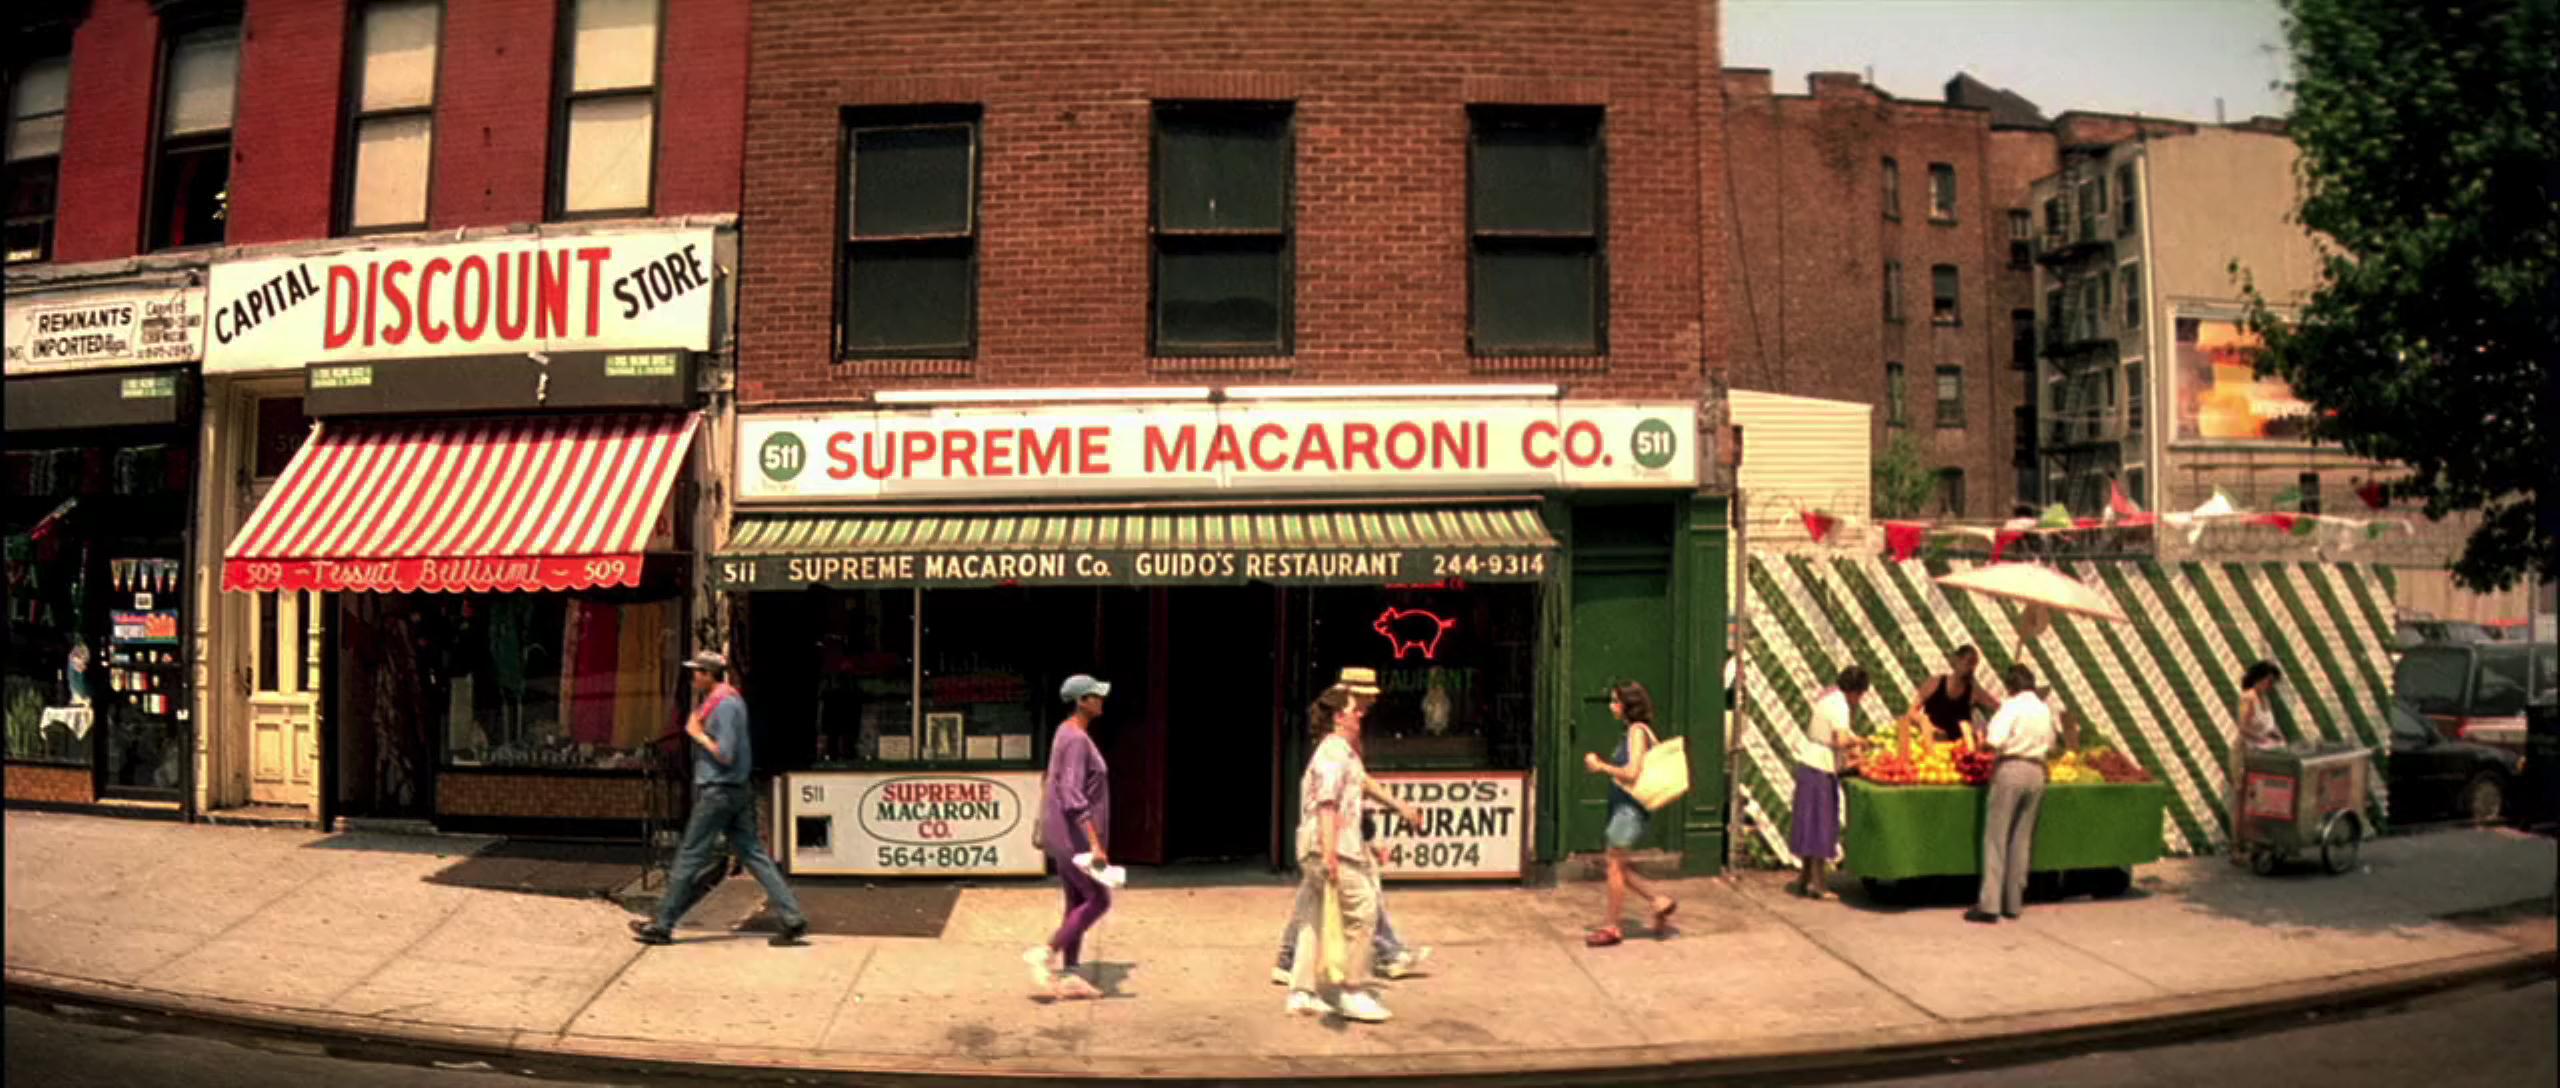 Supreme Macaroni Co